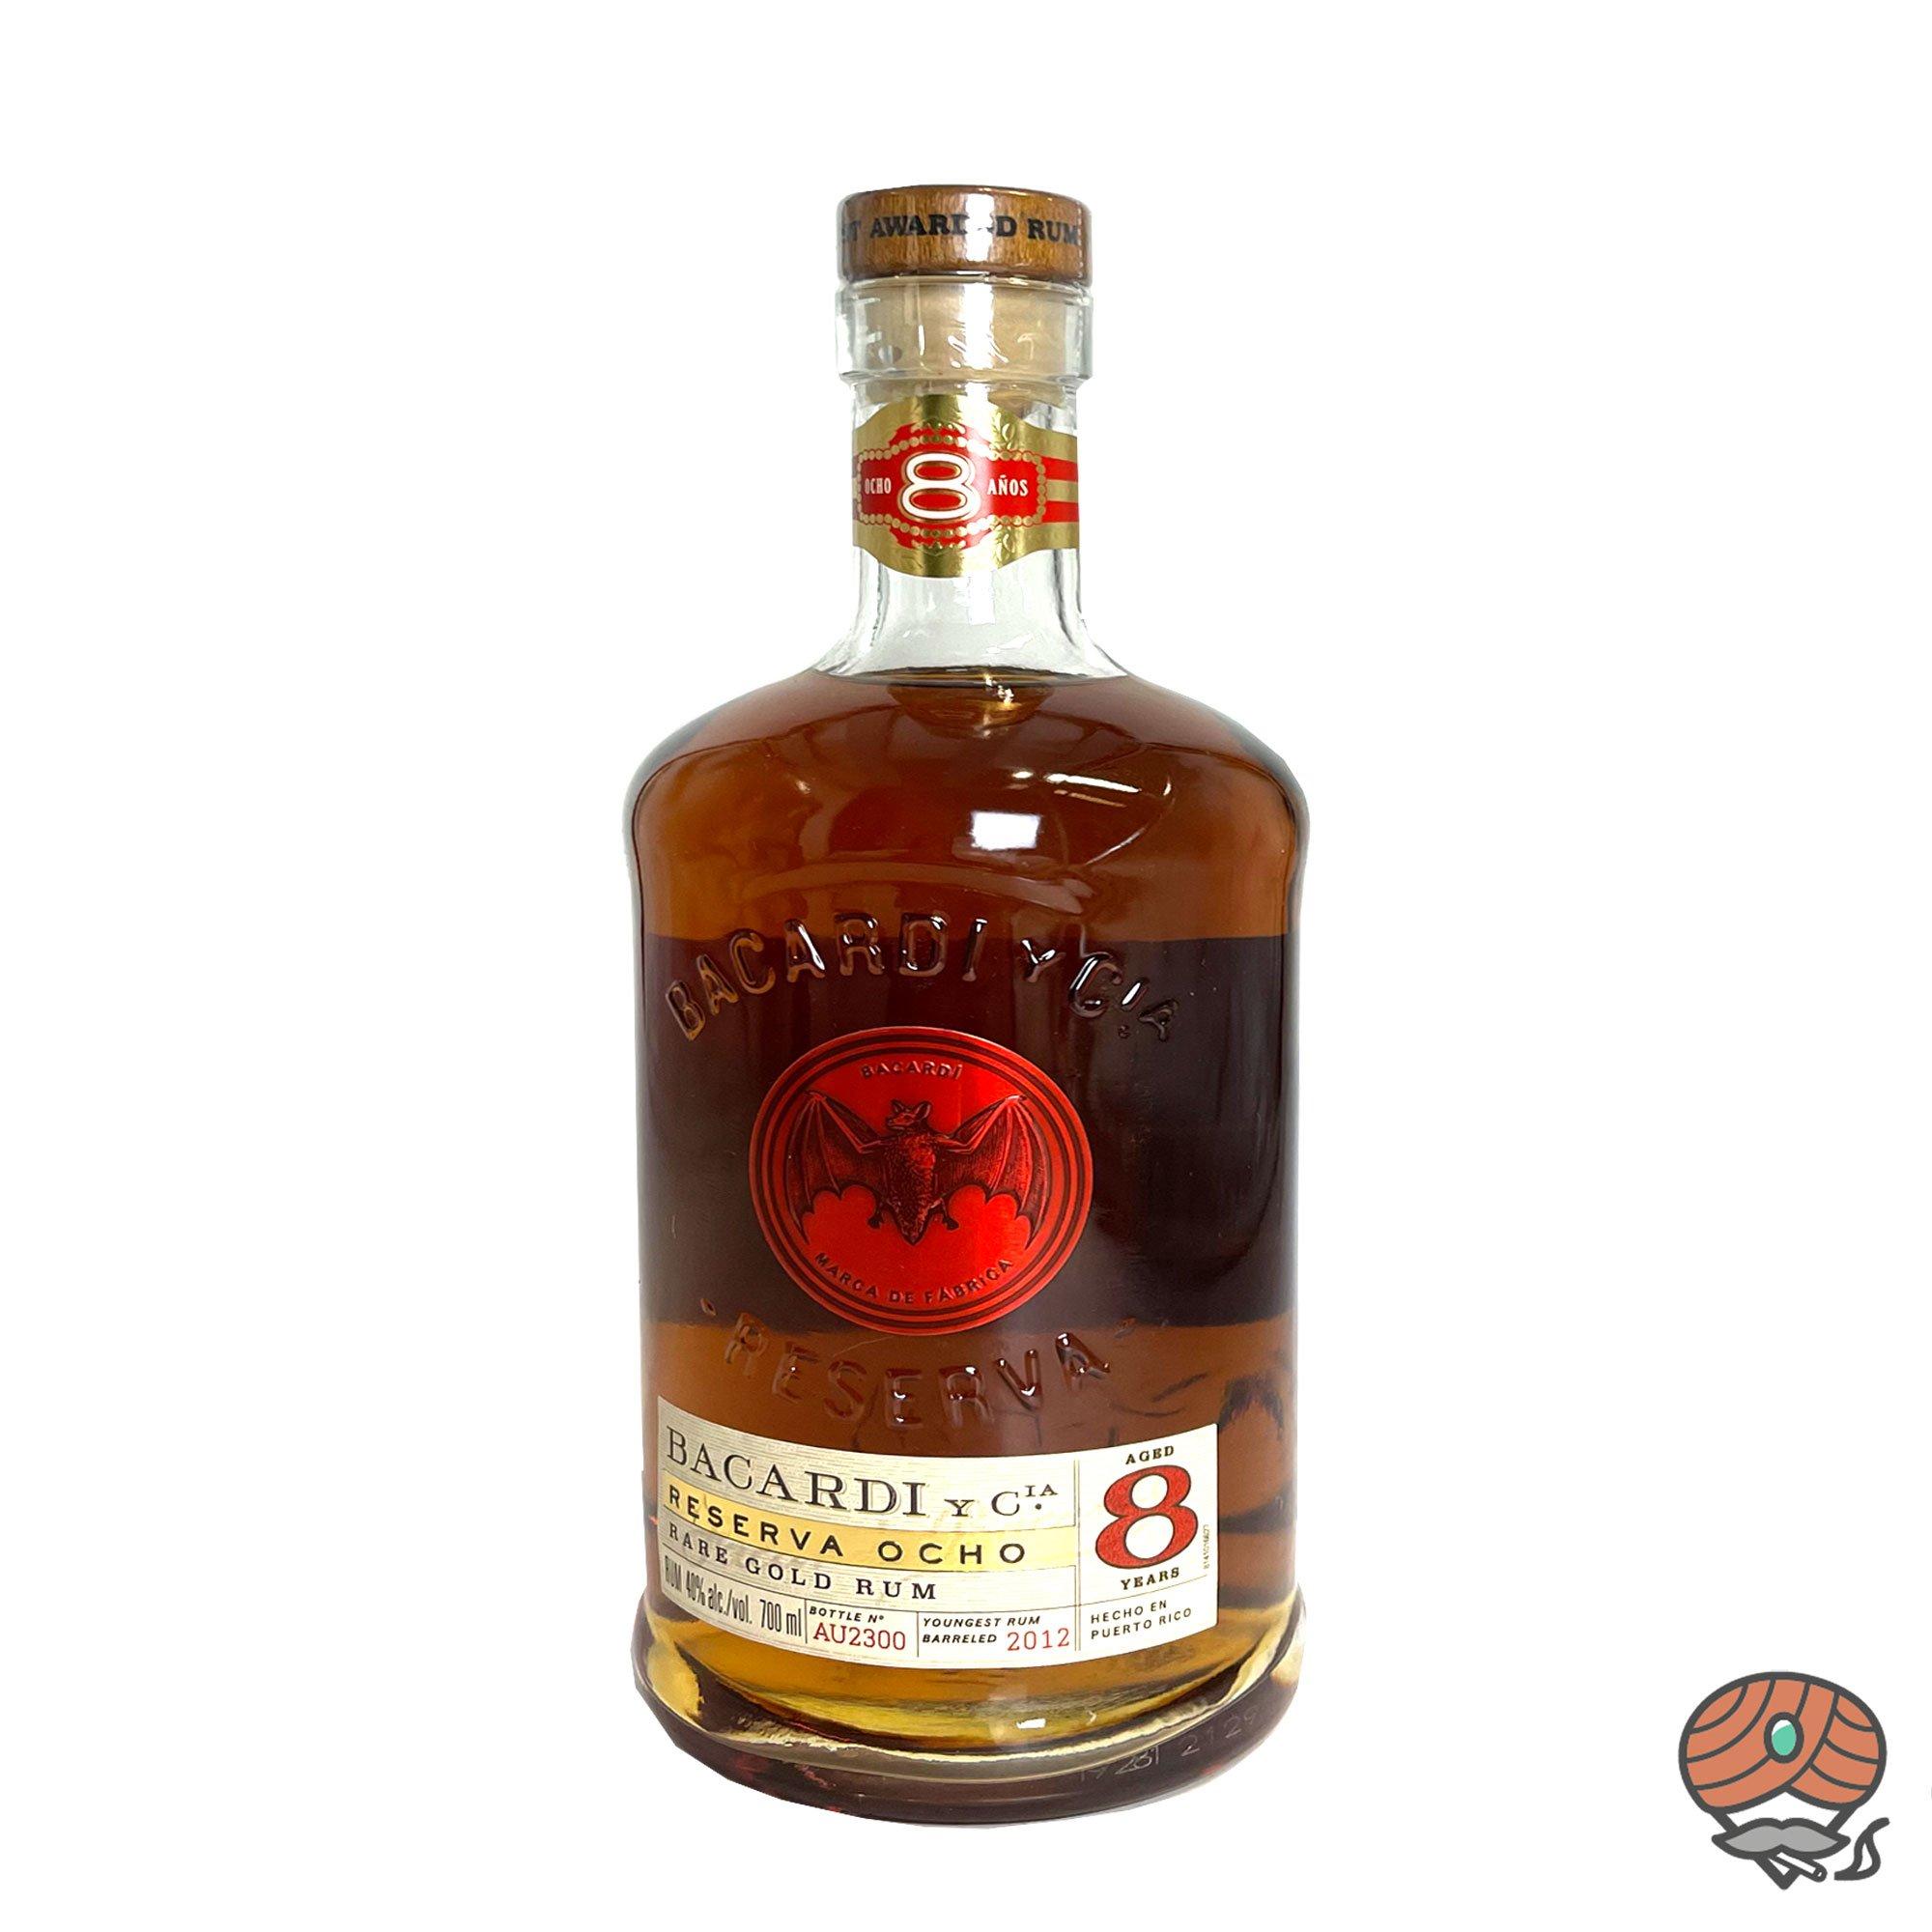 Bacardi Reserva Ocho 8 Anos Rum 0,7 l, alc. 40 Vol.-%